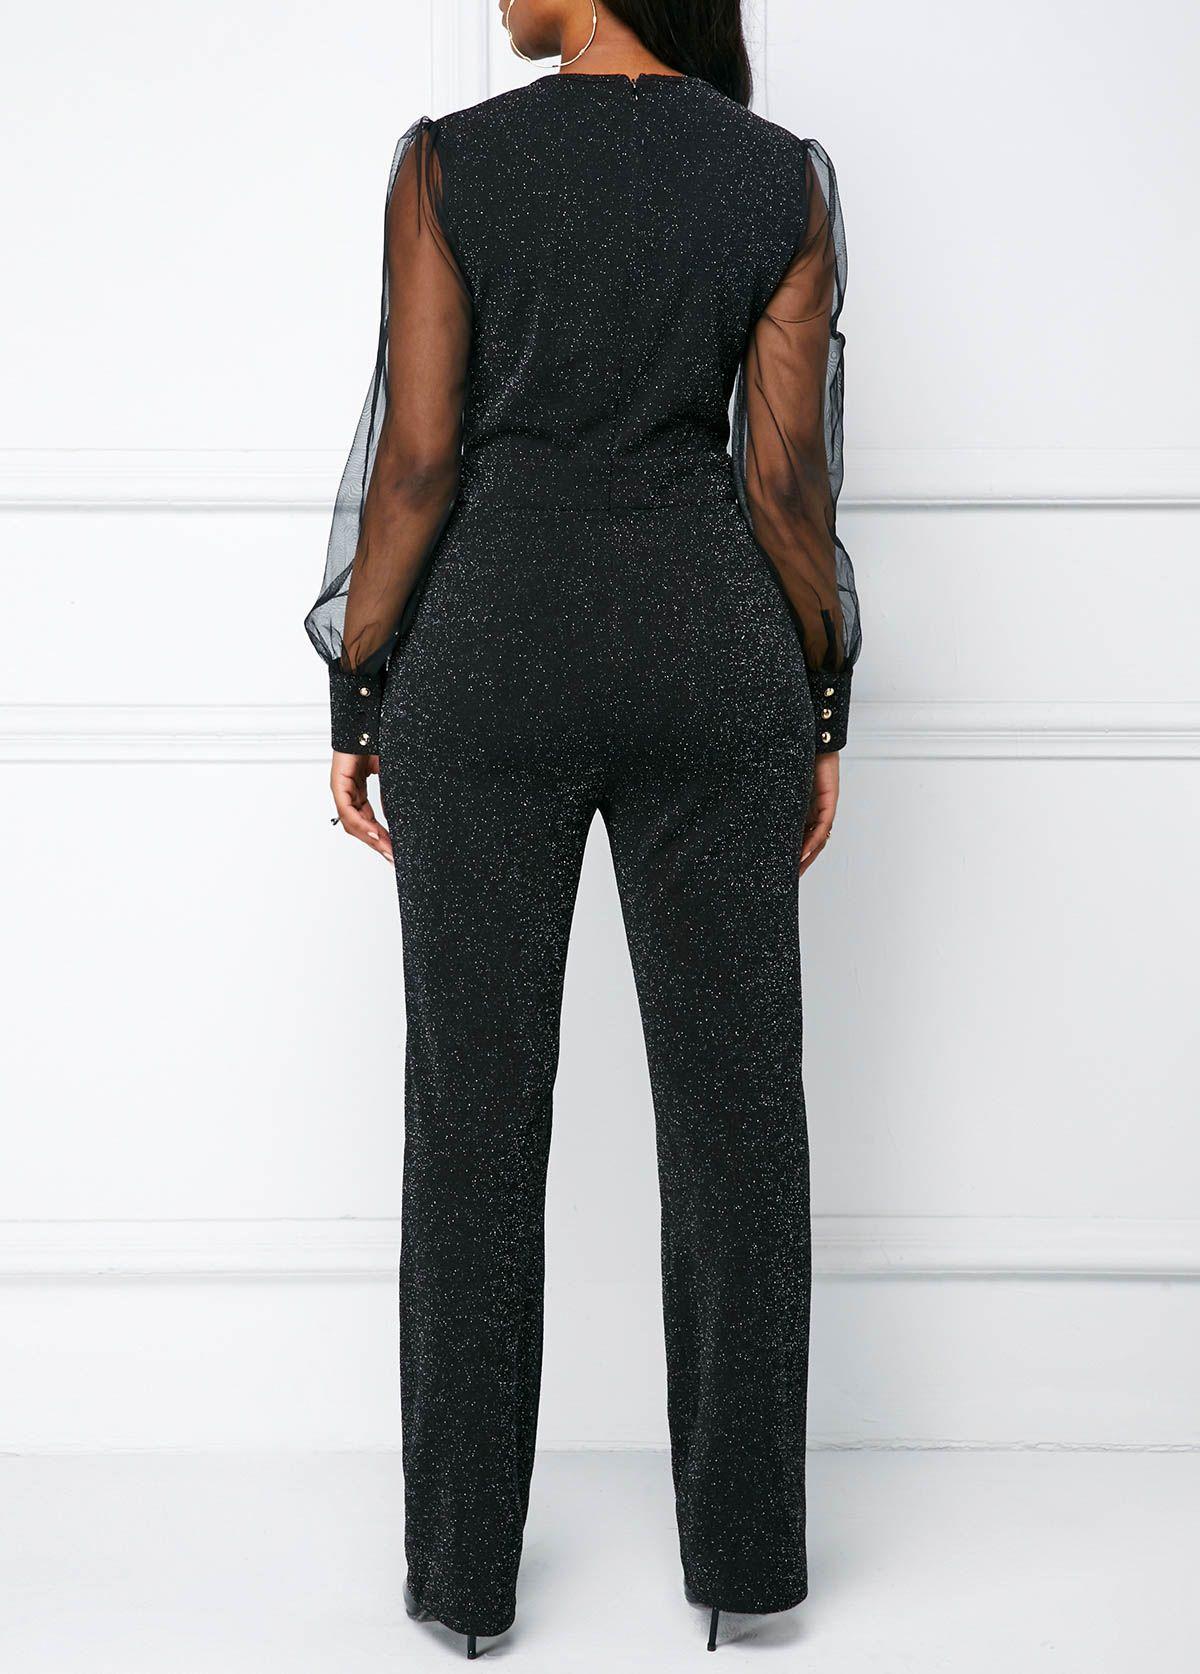 V Neck Mesh Panel Long Sleeve Black Jumpsuit Rotita Com Usd 31 56 Classy Jumpsuit Black Dresses Classy Jumpsuit Dressy [ 1674 x 1200 Pixel ]